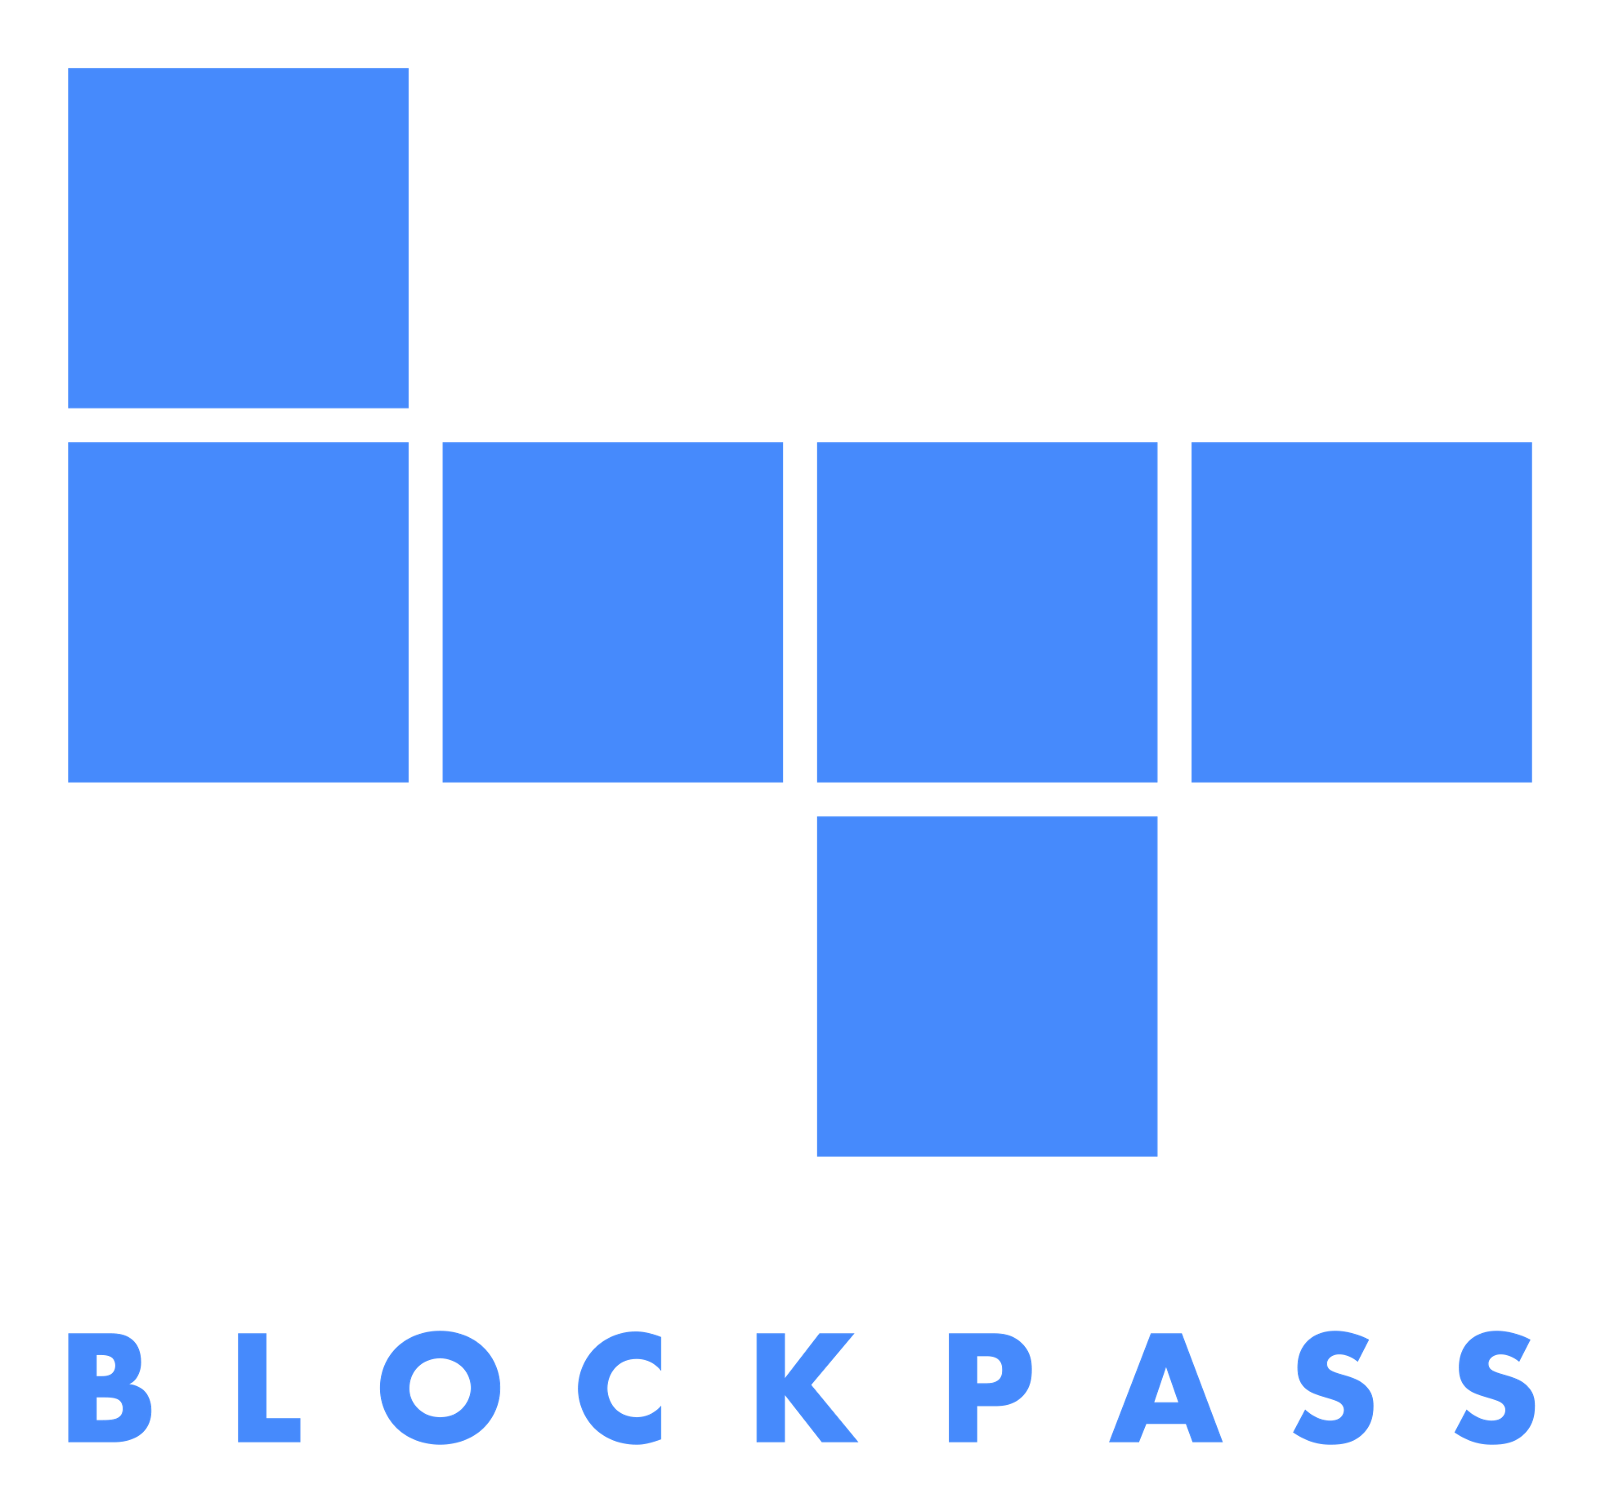 Blockpass-Logo.png